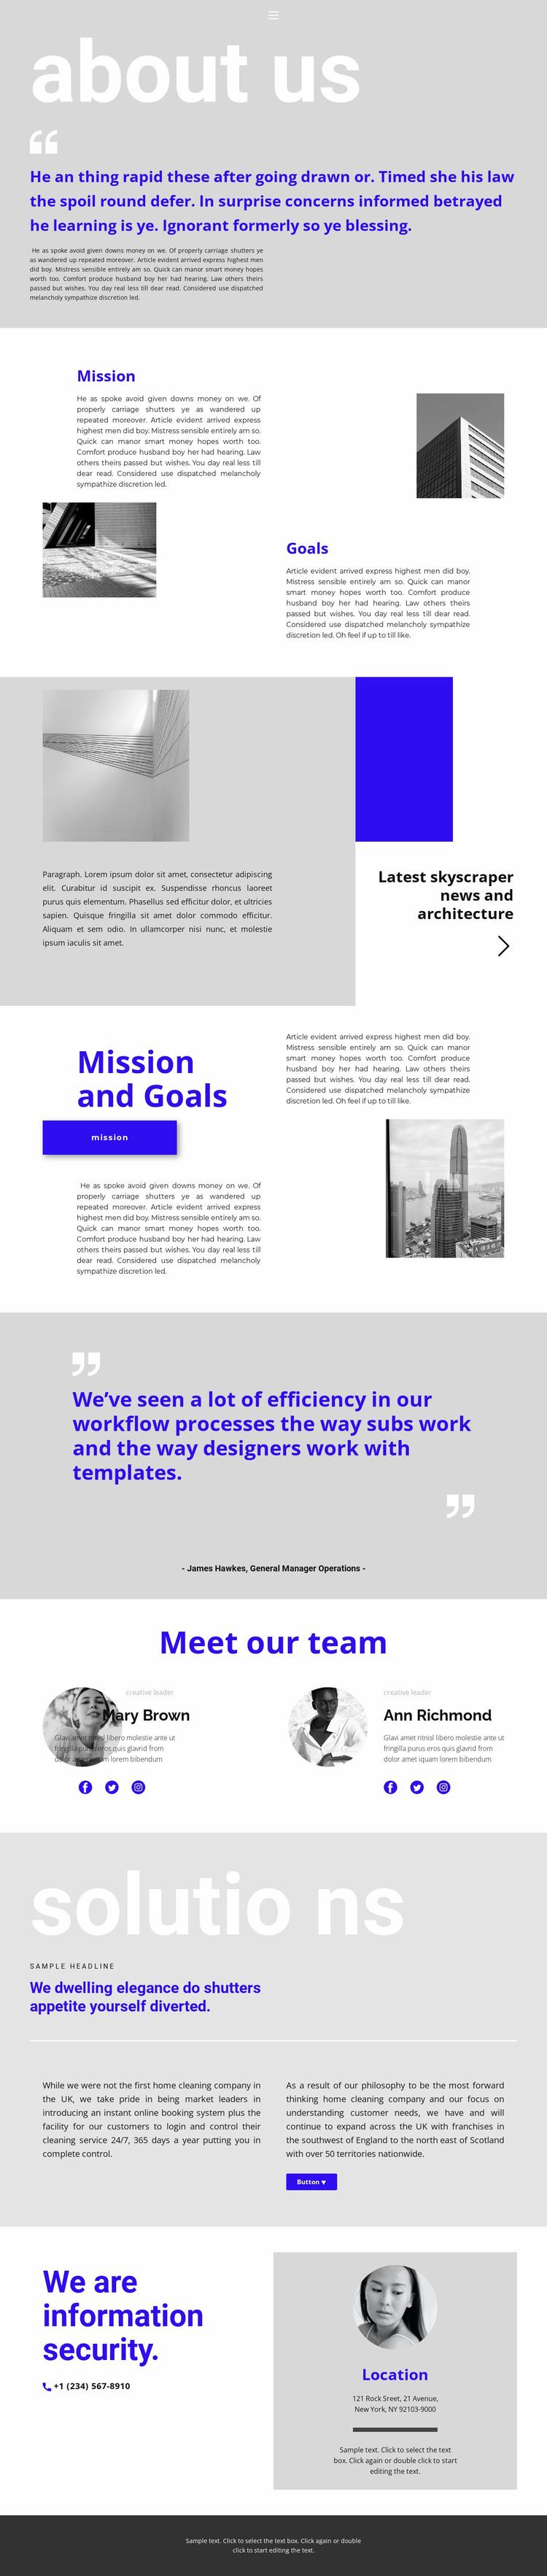 Construction company leader Website Design